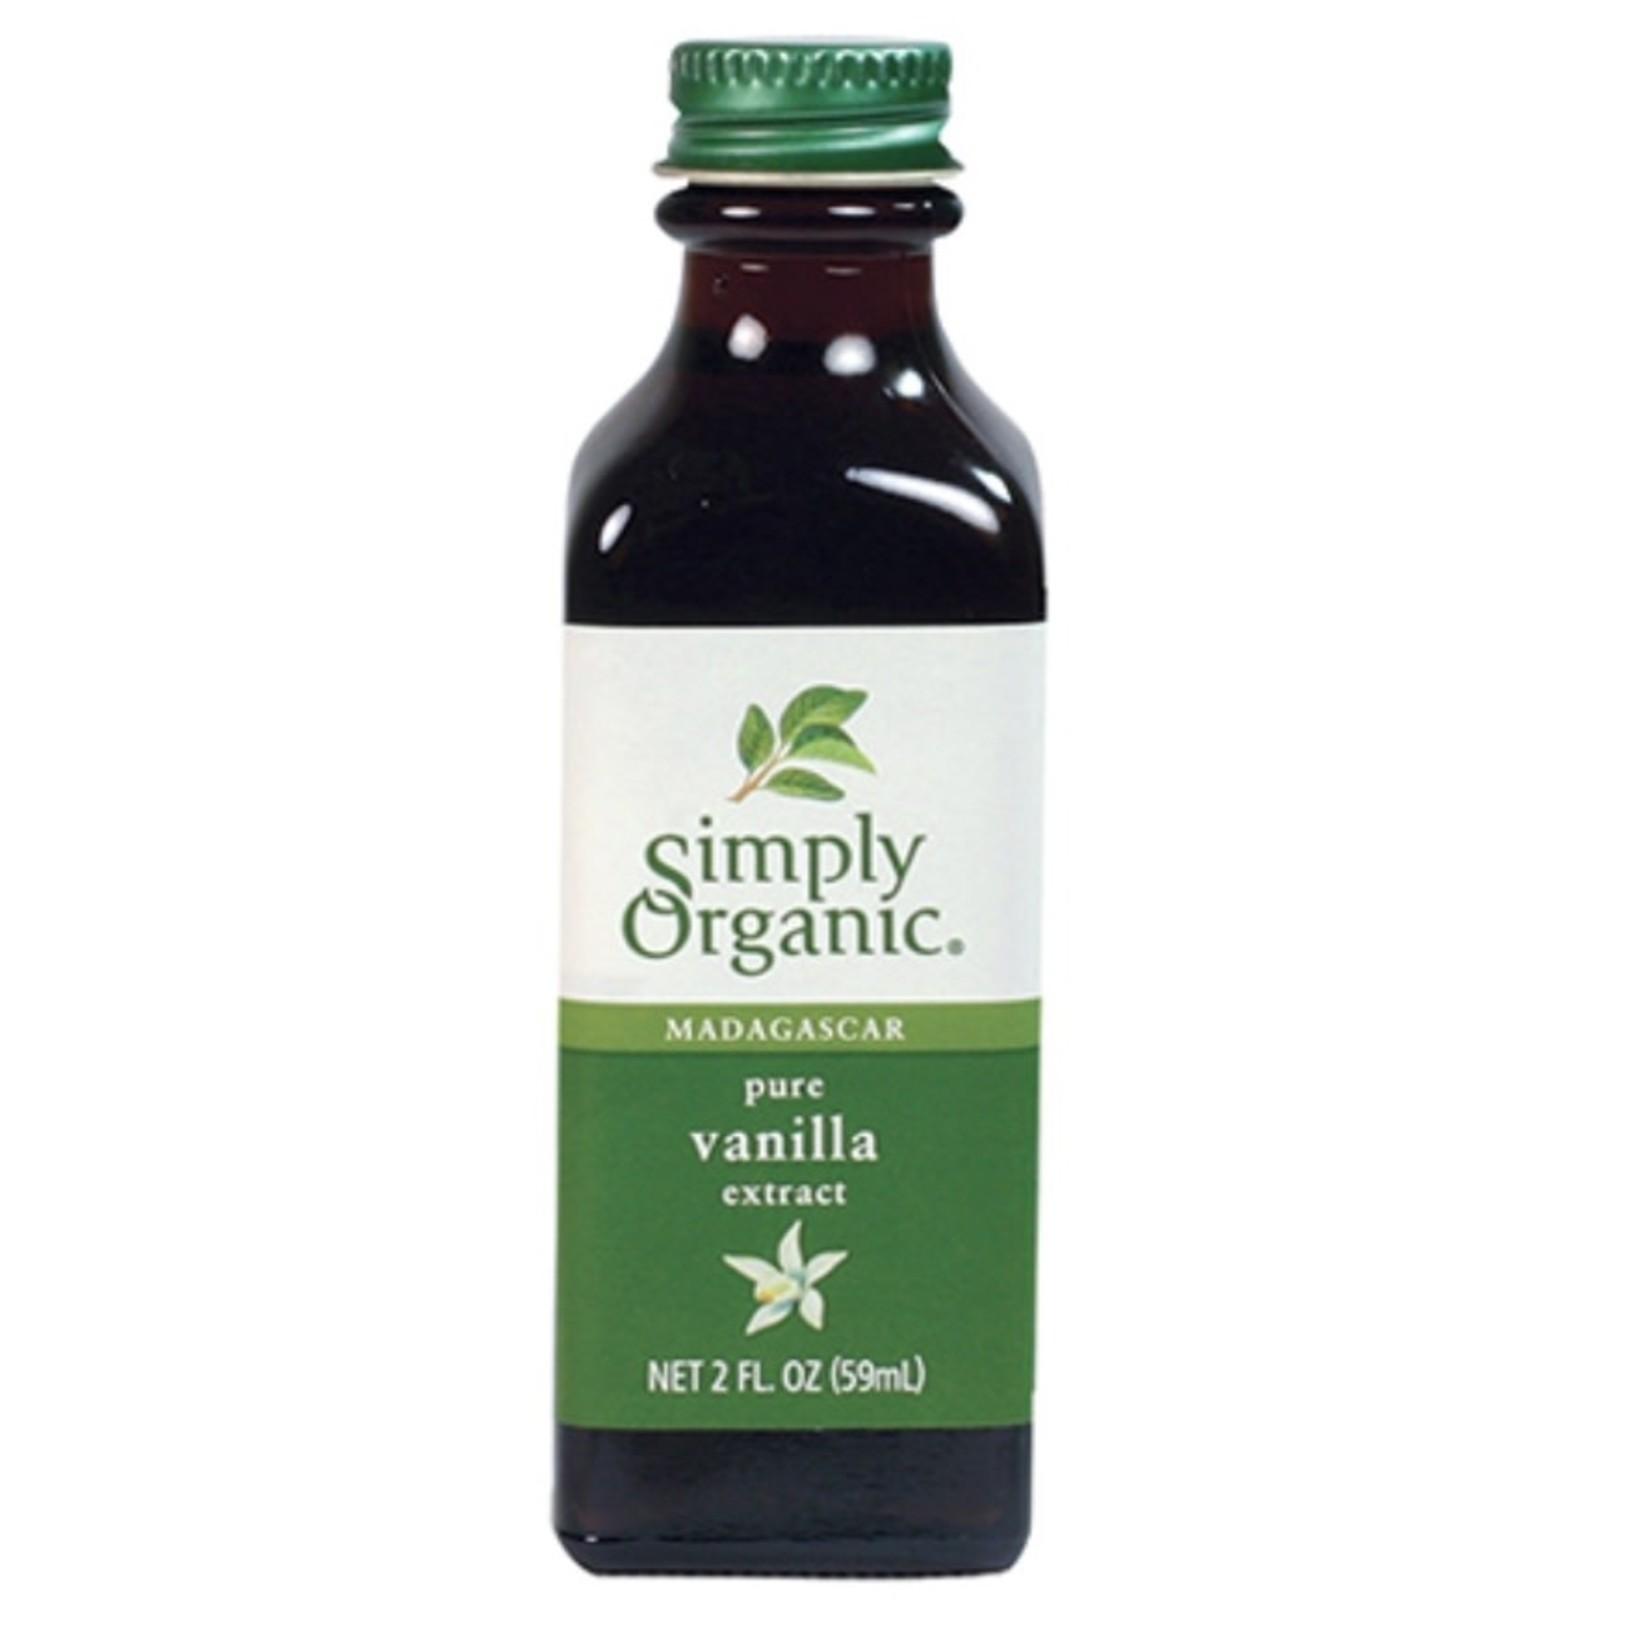 Simply Organic Simply Organic Vanilla Extract 59ml